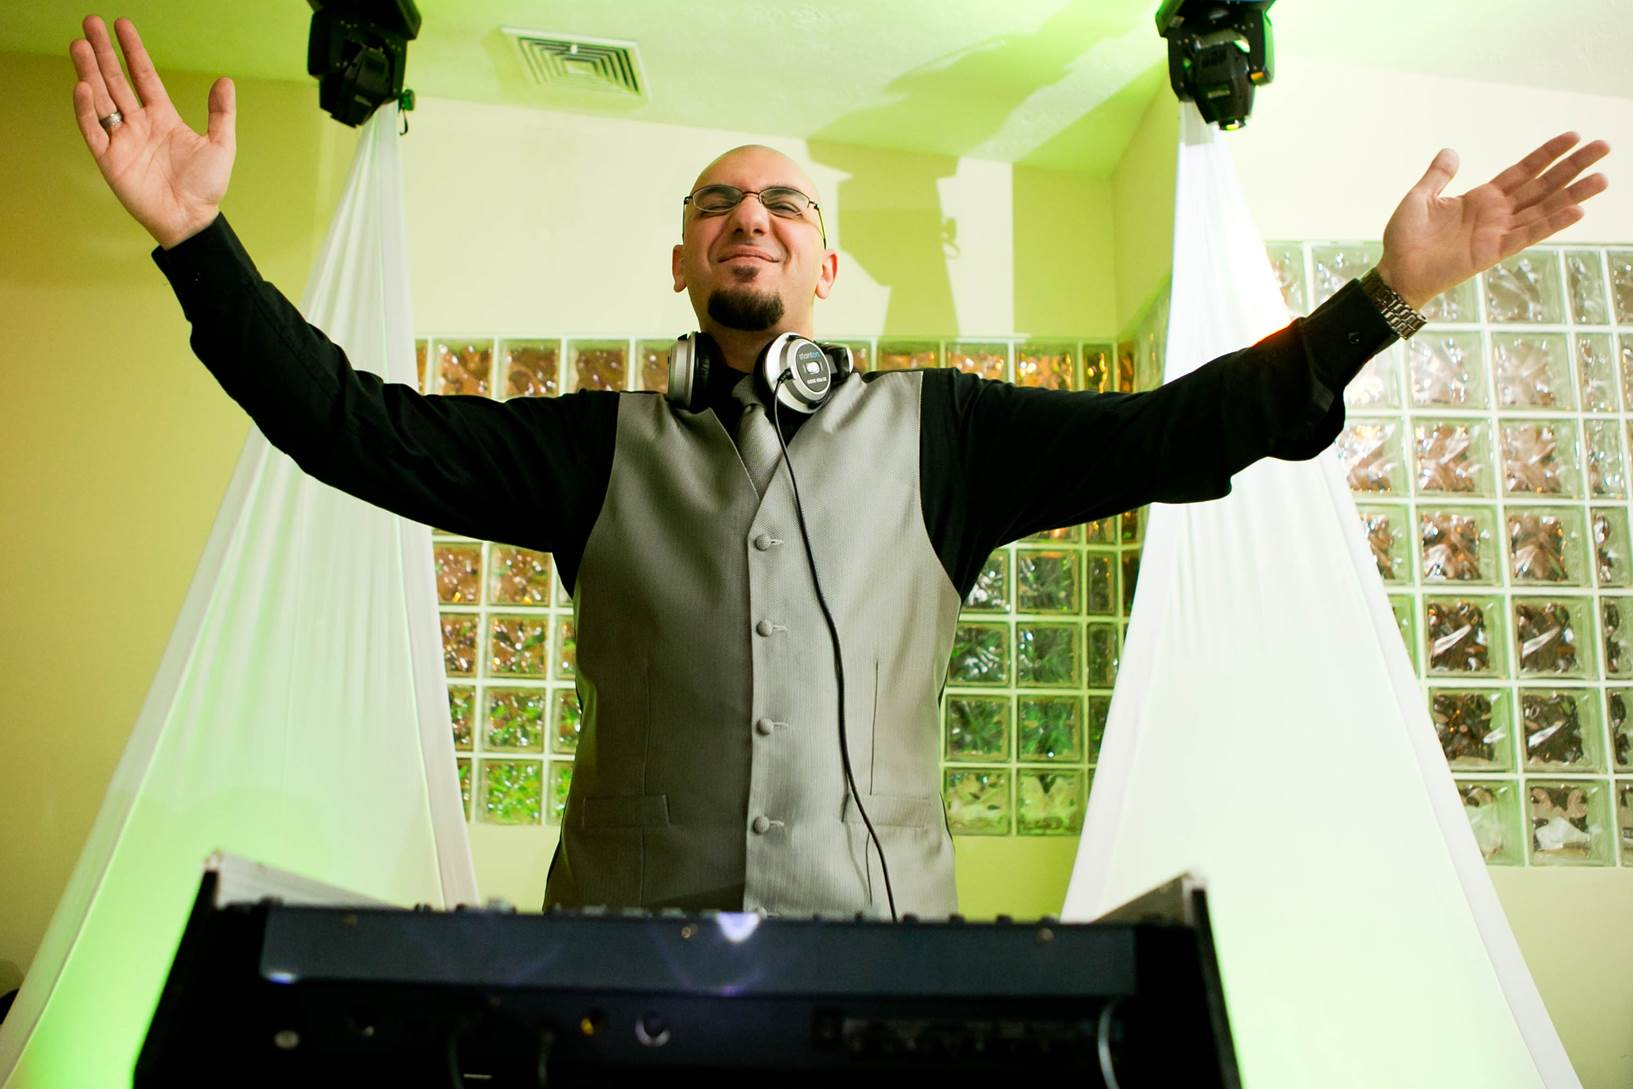 DJ Kibar from A Main Event